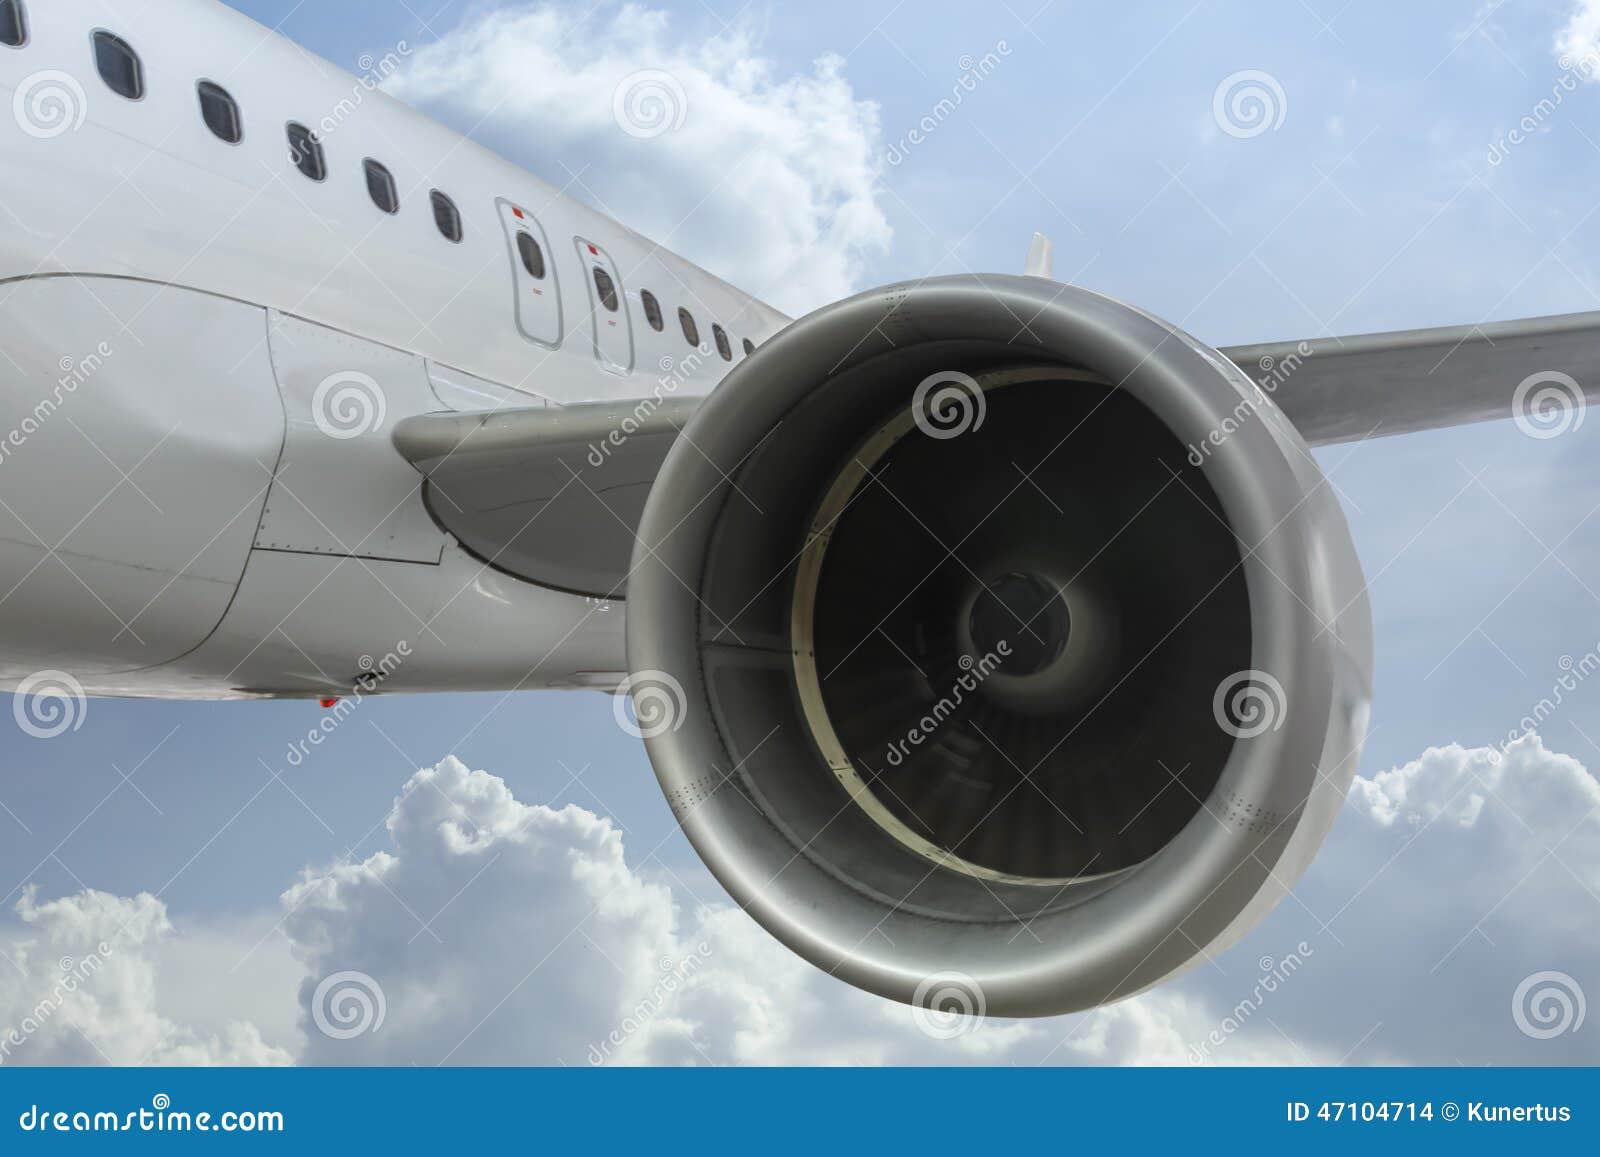 Detail of Jet Engine inflight